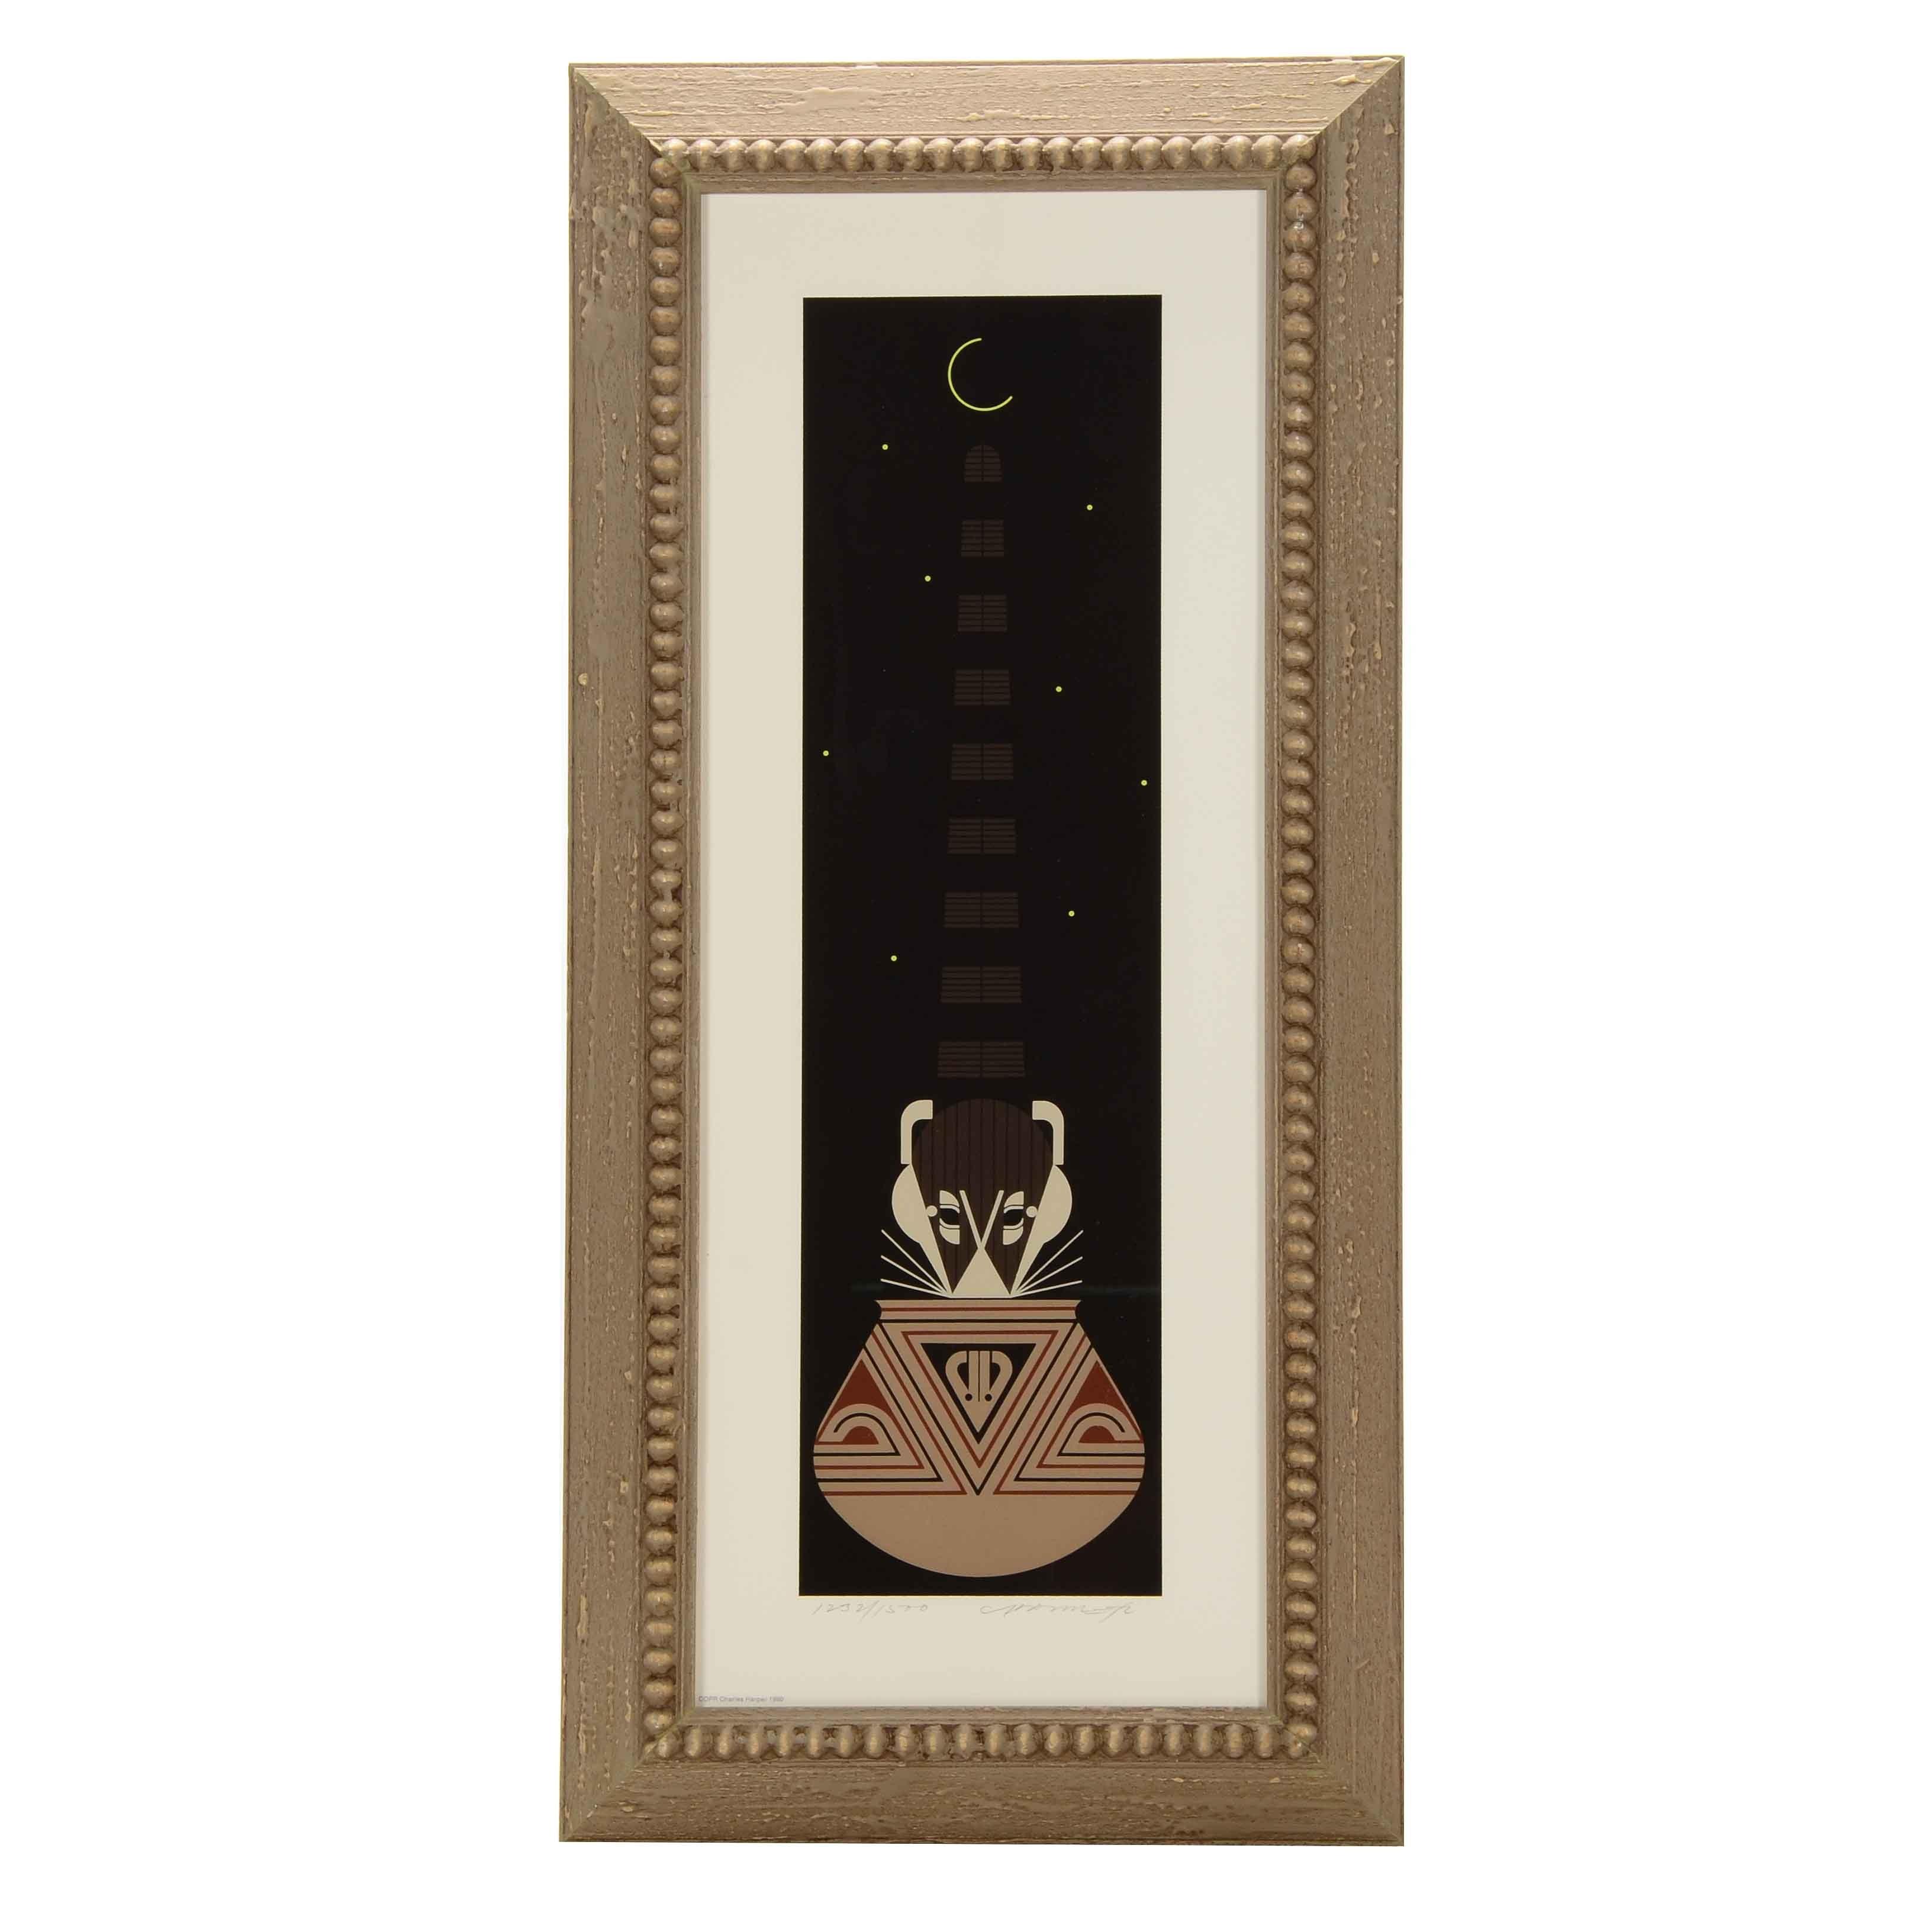 "Charley Harper Limited Edition Serigraph ""Potluck"""